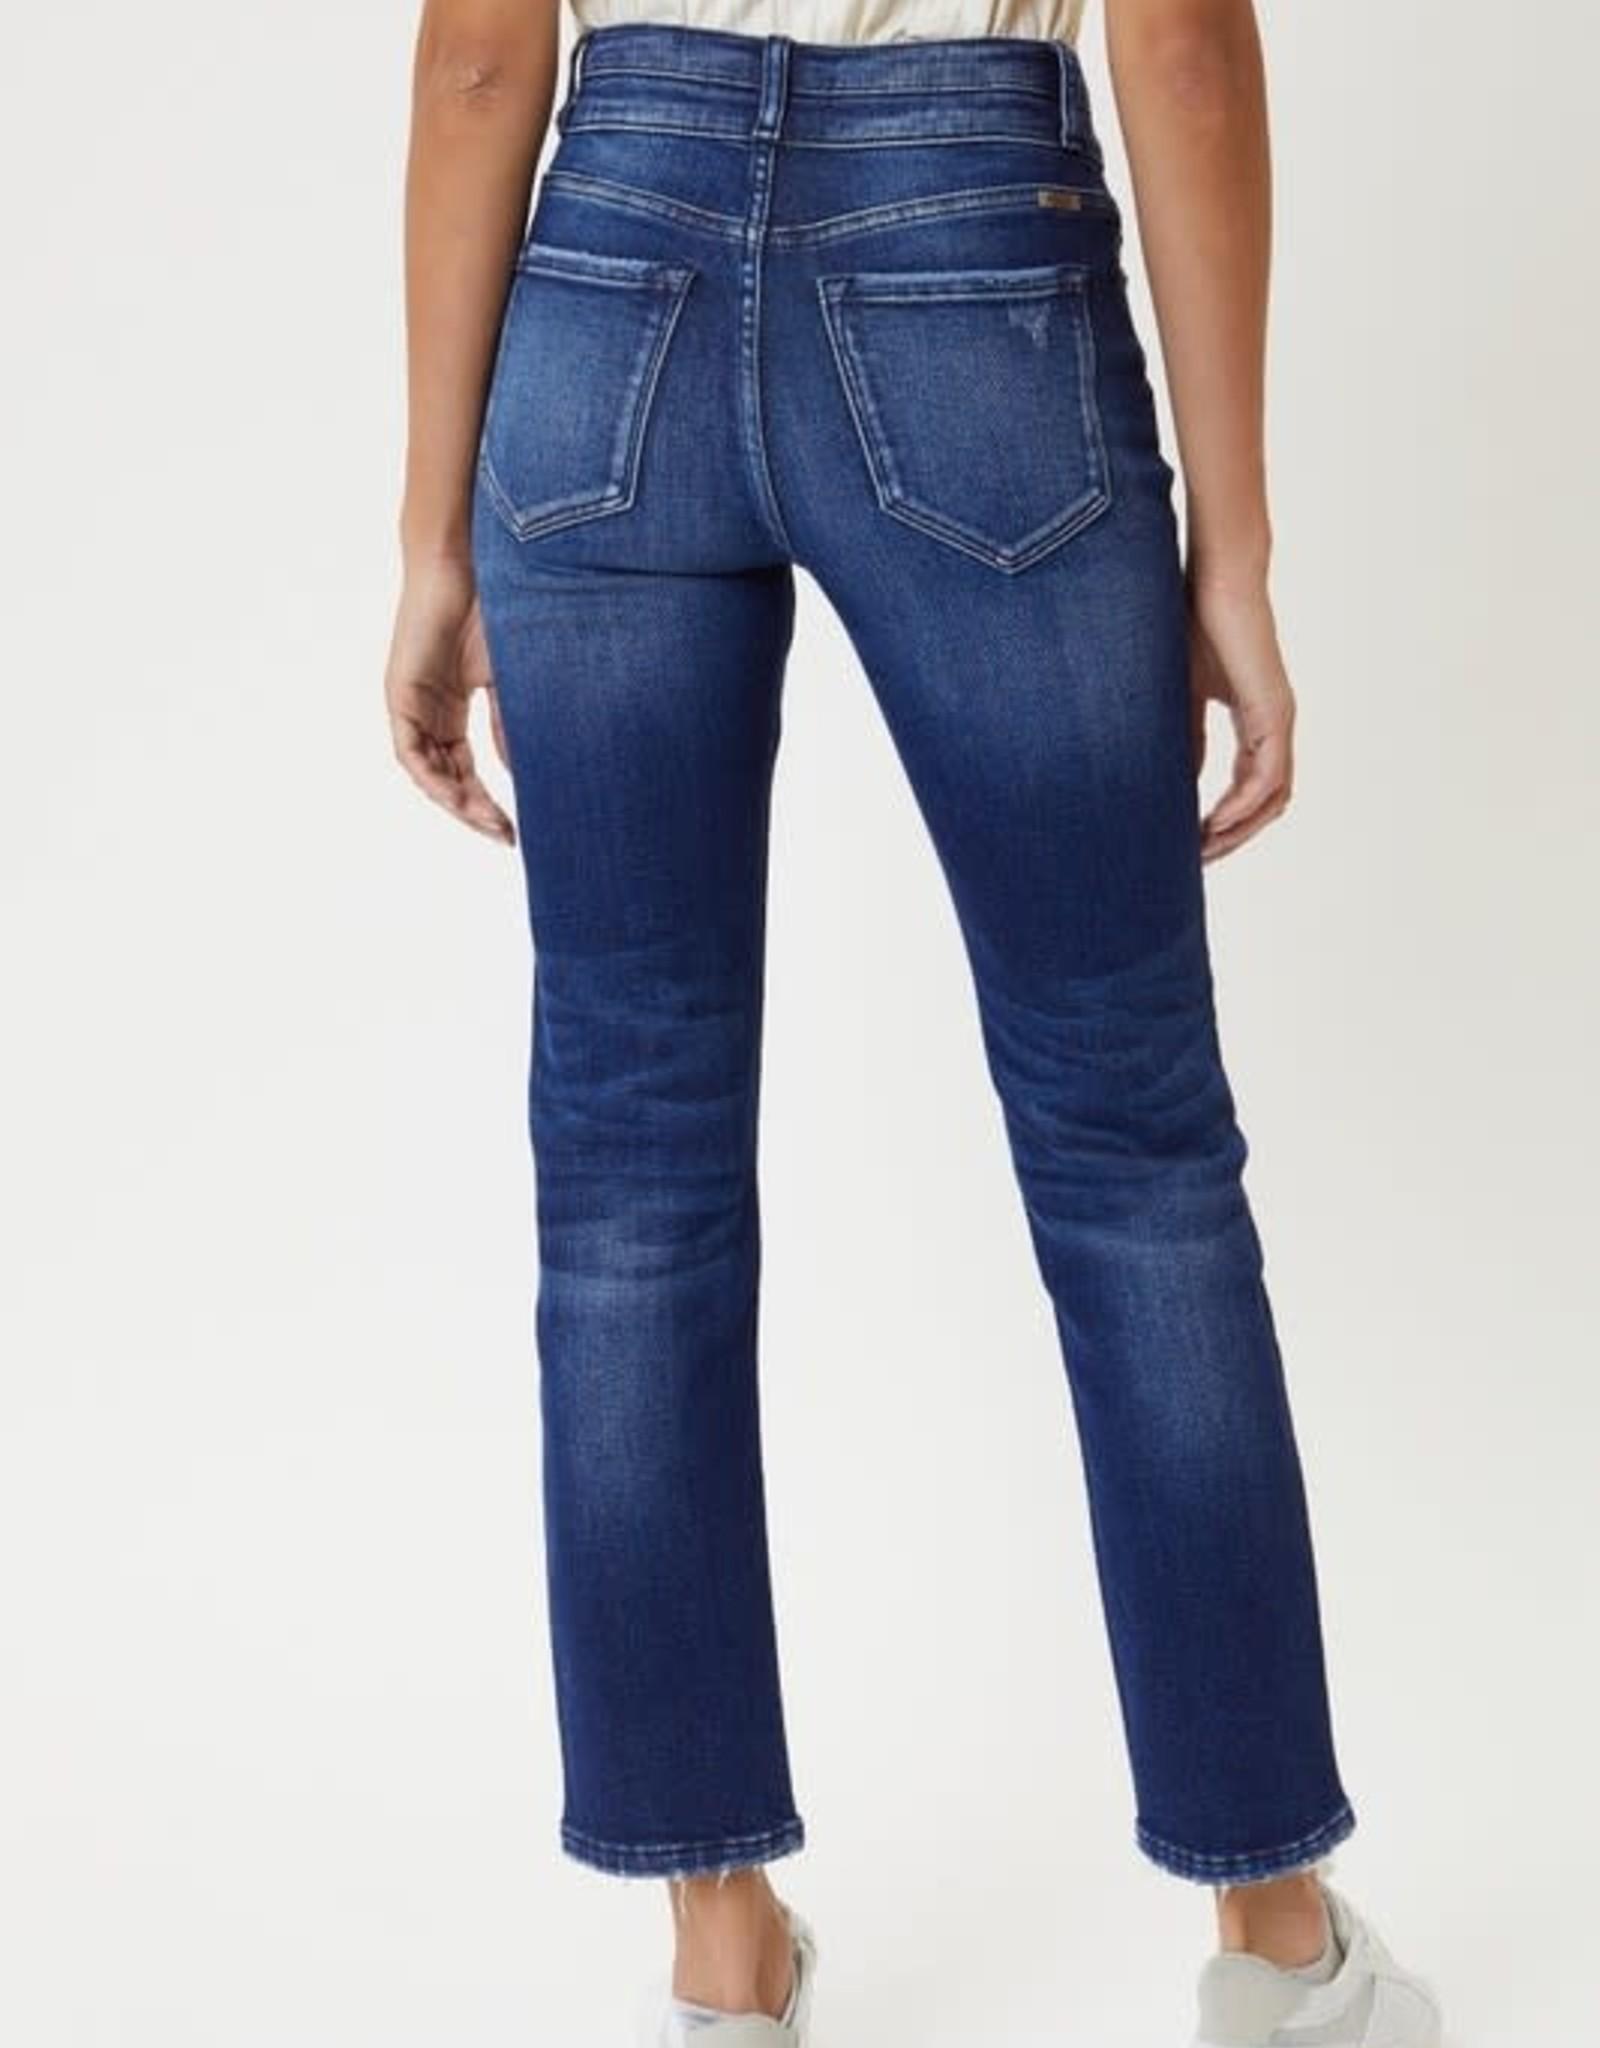 Miss Bliss High Rise Straight Leg Cropped Jean- Dark